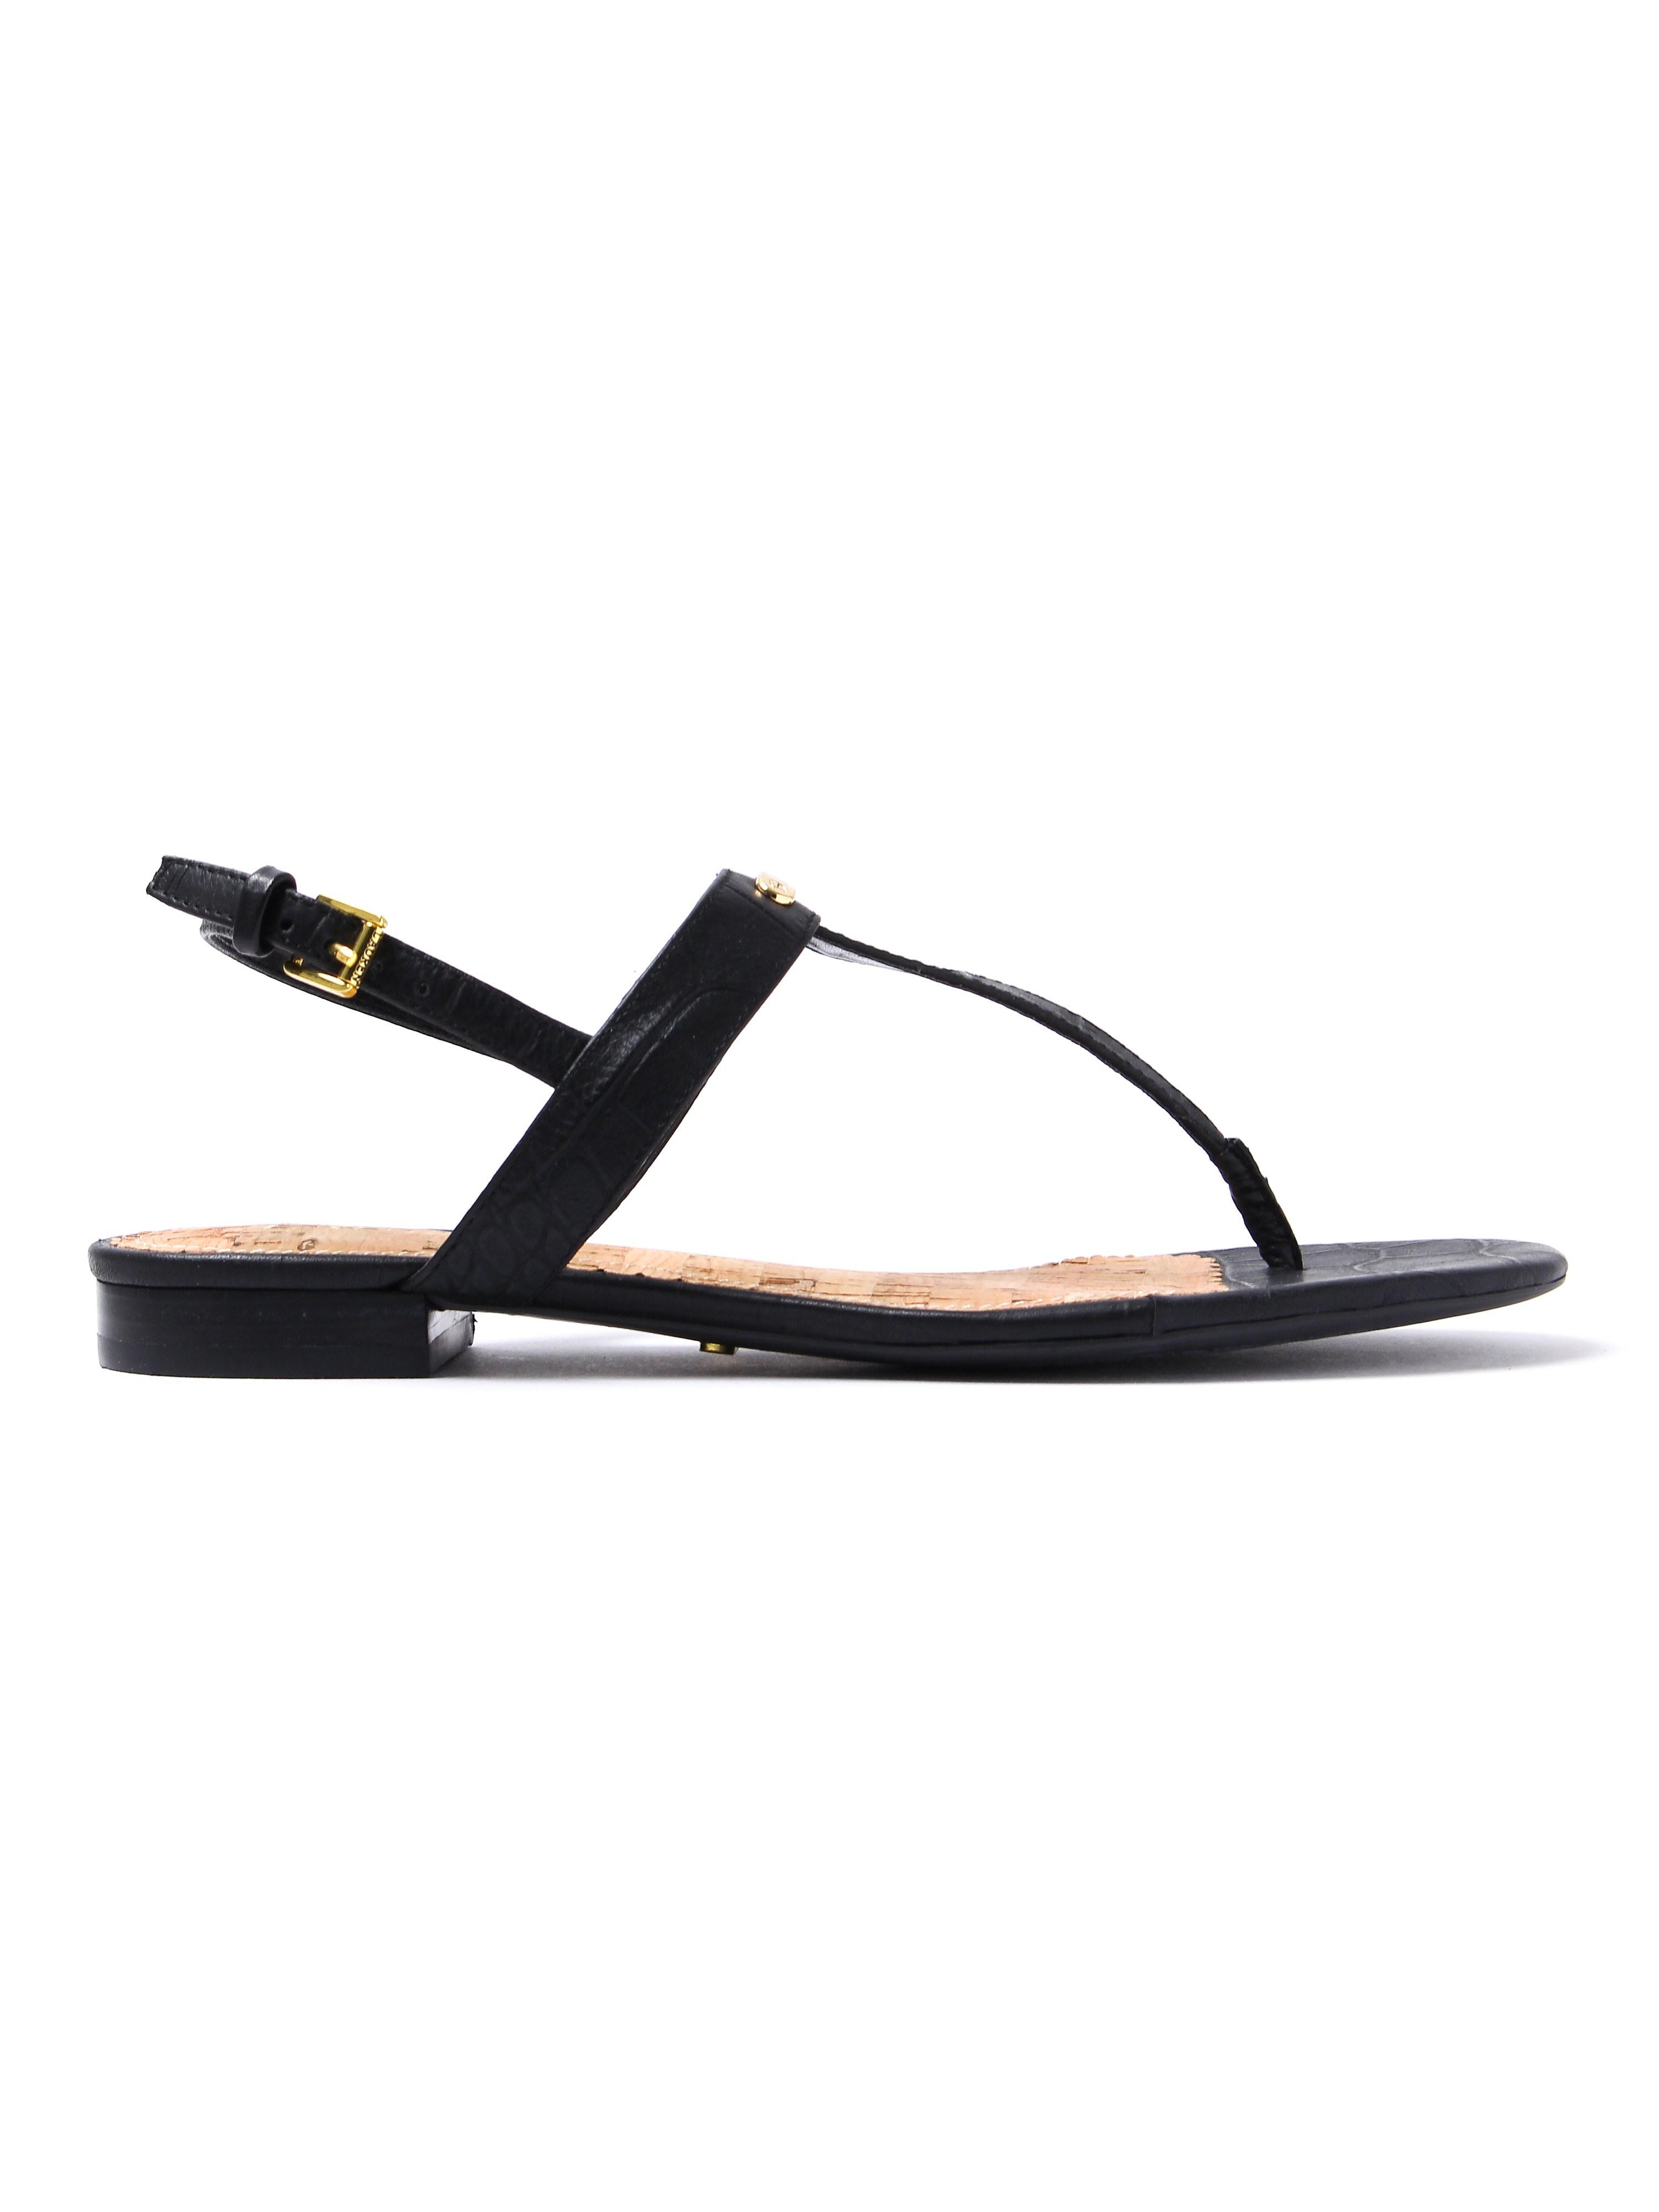 Polo Ralph Lauren Women's Valla Leather Toe Post Sandals - Black